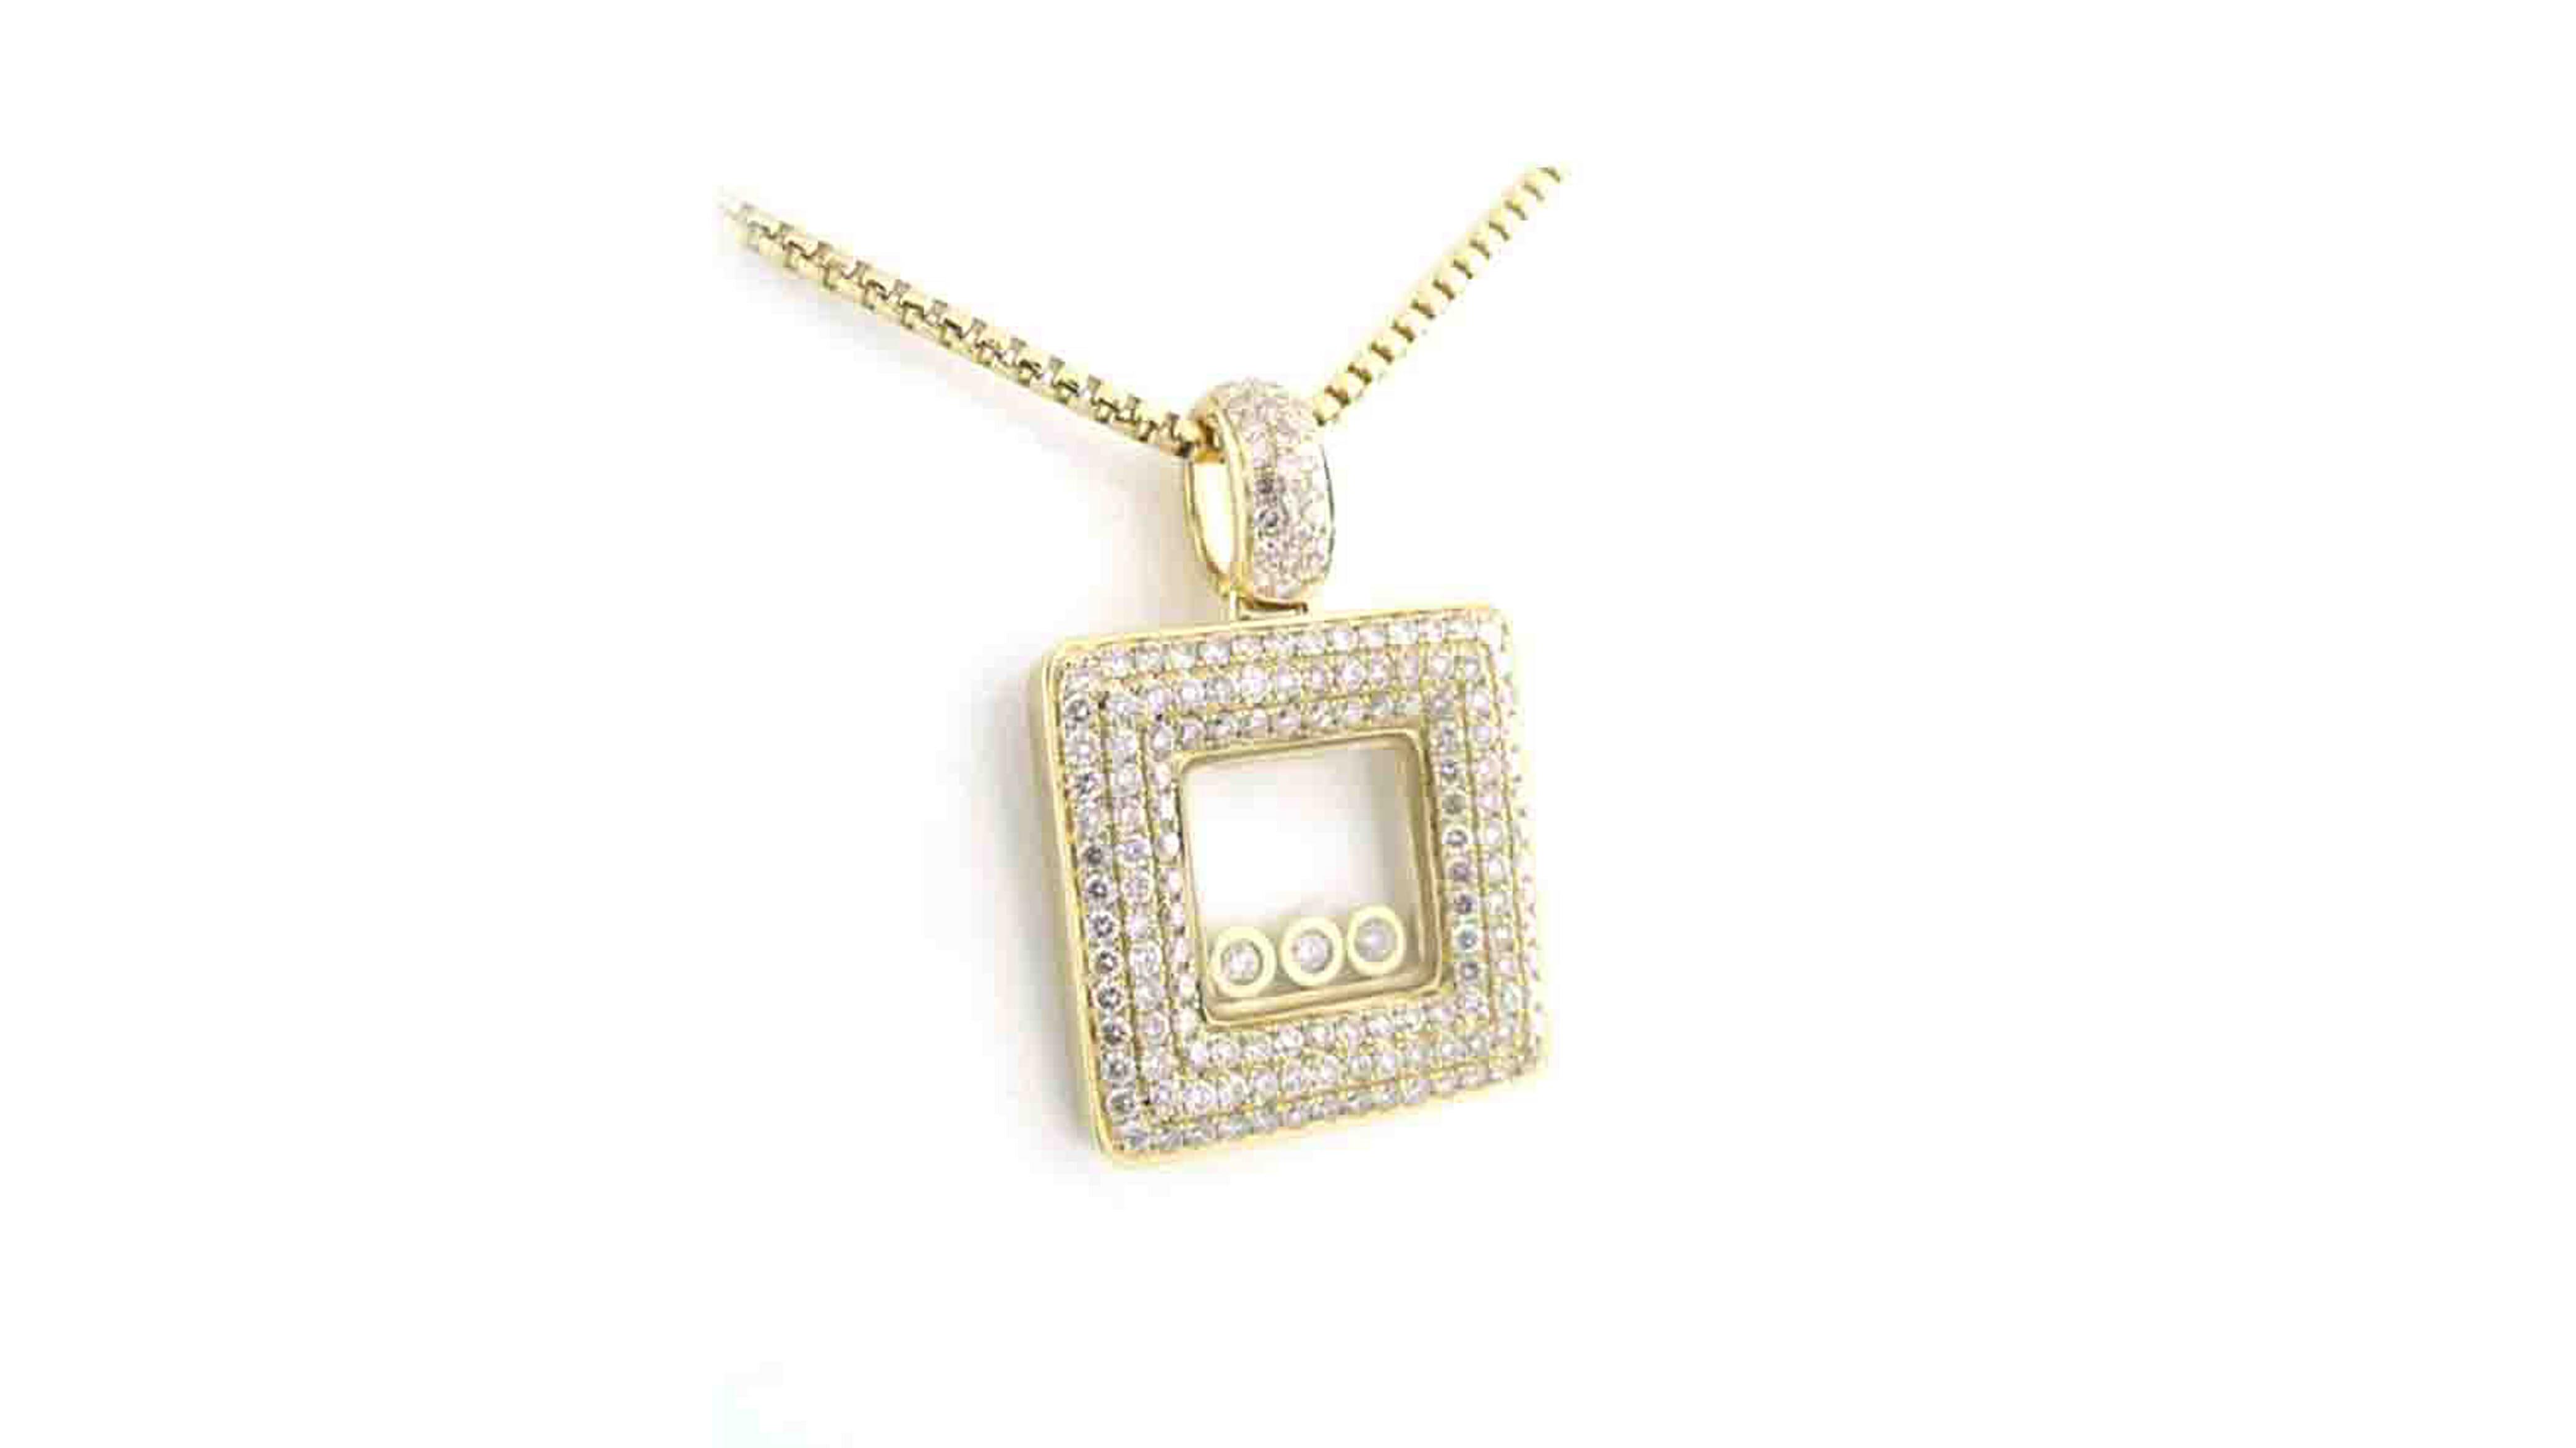 Yellow gold enchanted square, 3 diamond, diamond pendant